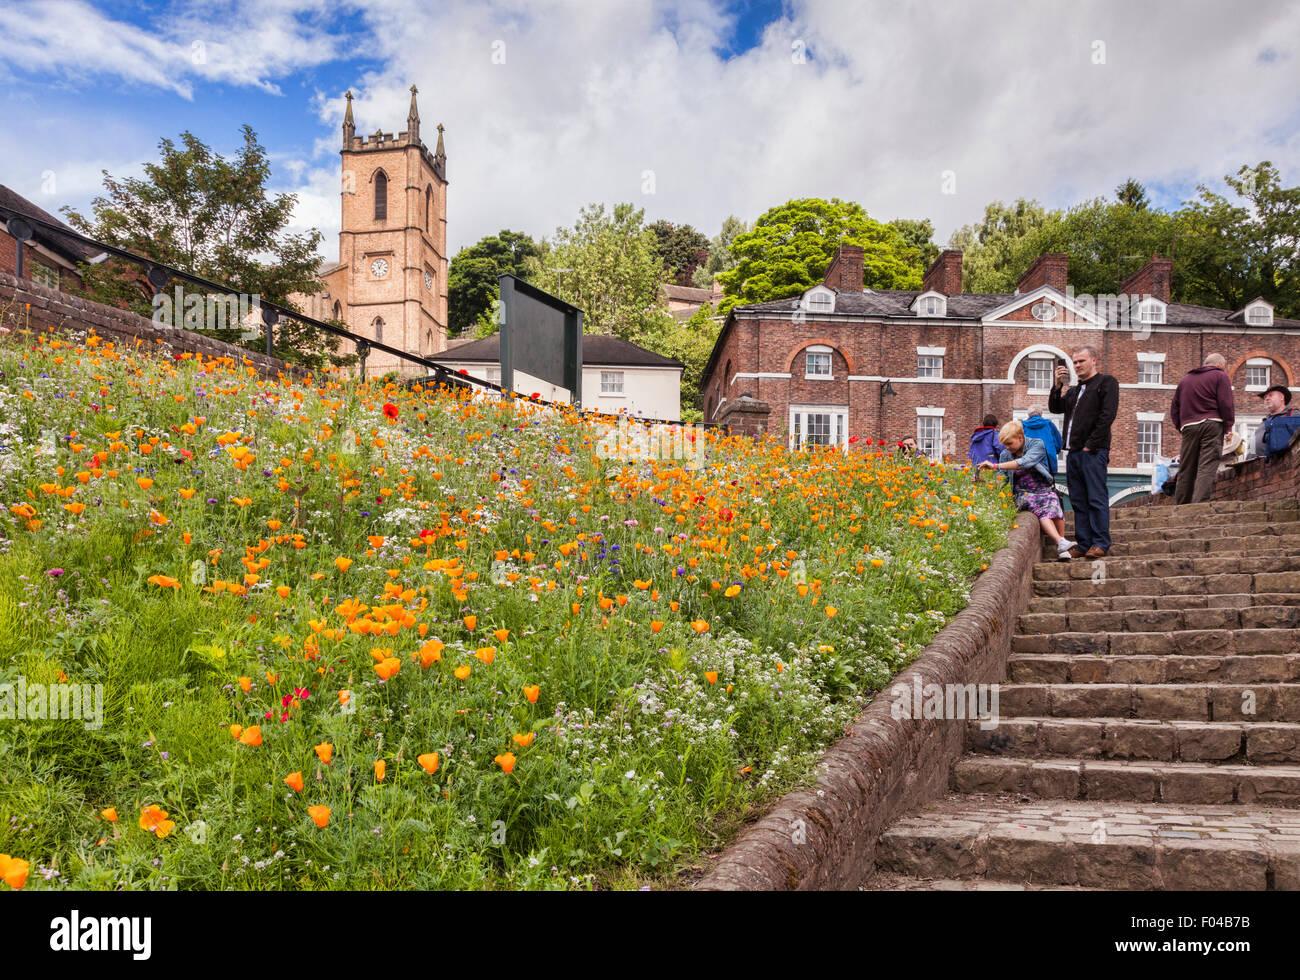 Tourists gather near the Iron Bridge in the village of Ironbridge, Shropshire, England - Stock Image